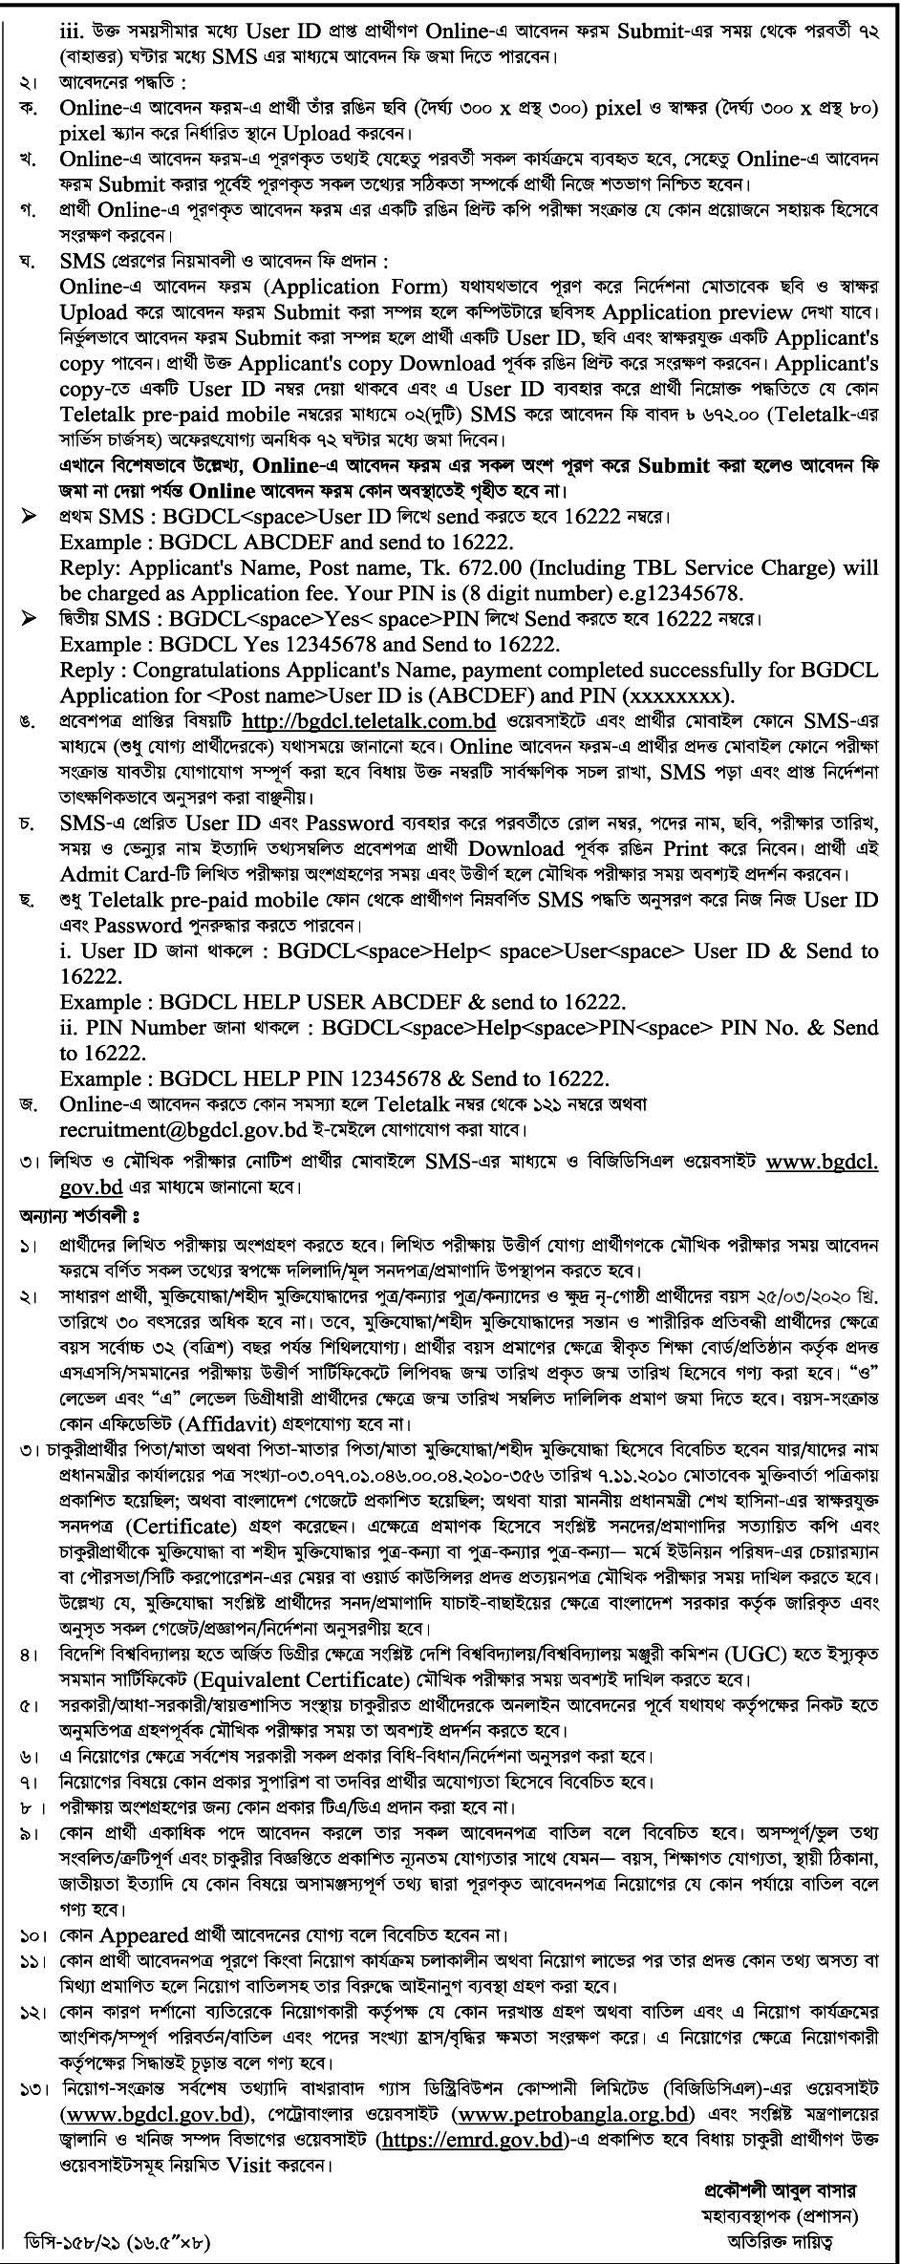 Petrobangla Job Notice 2021